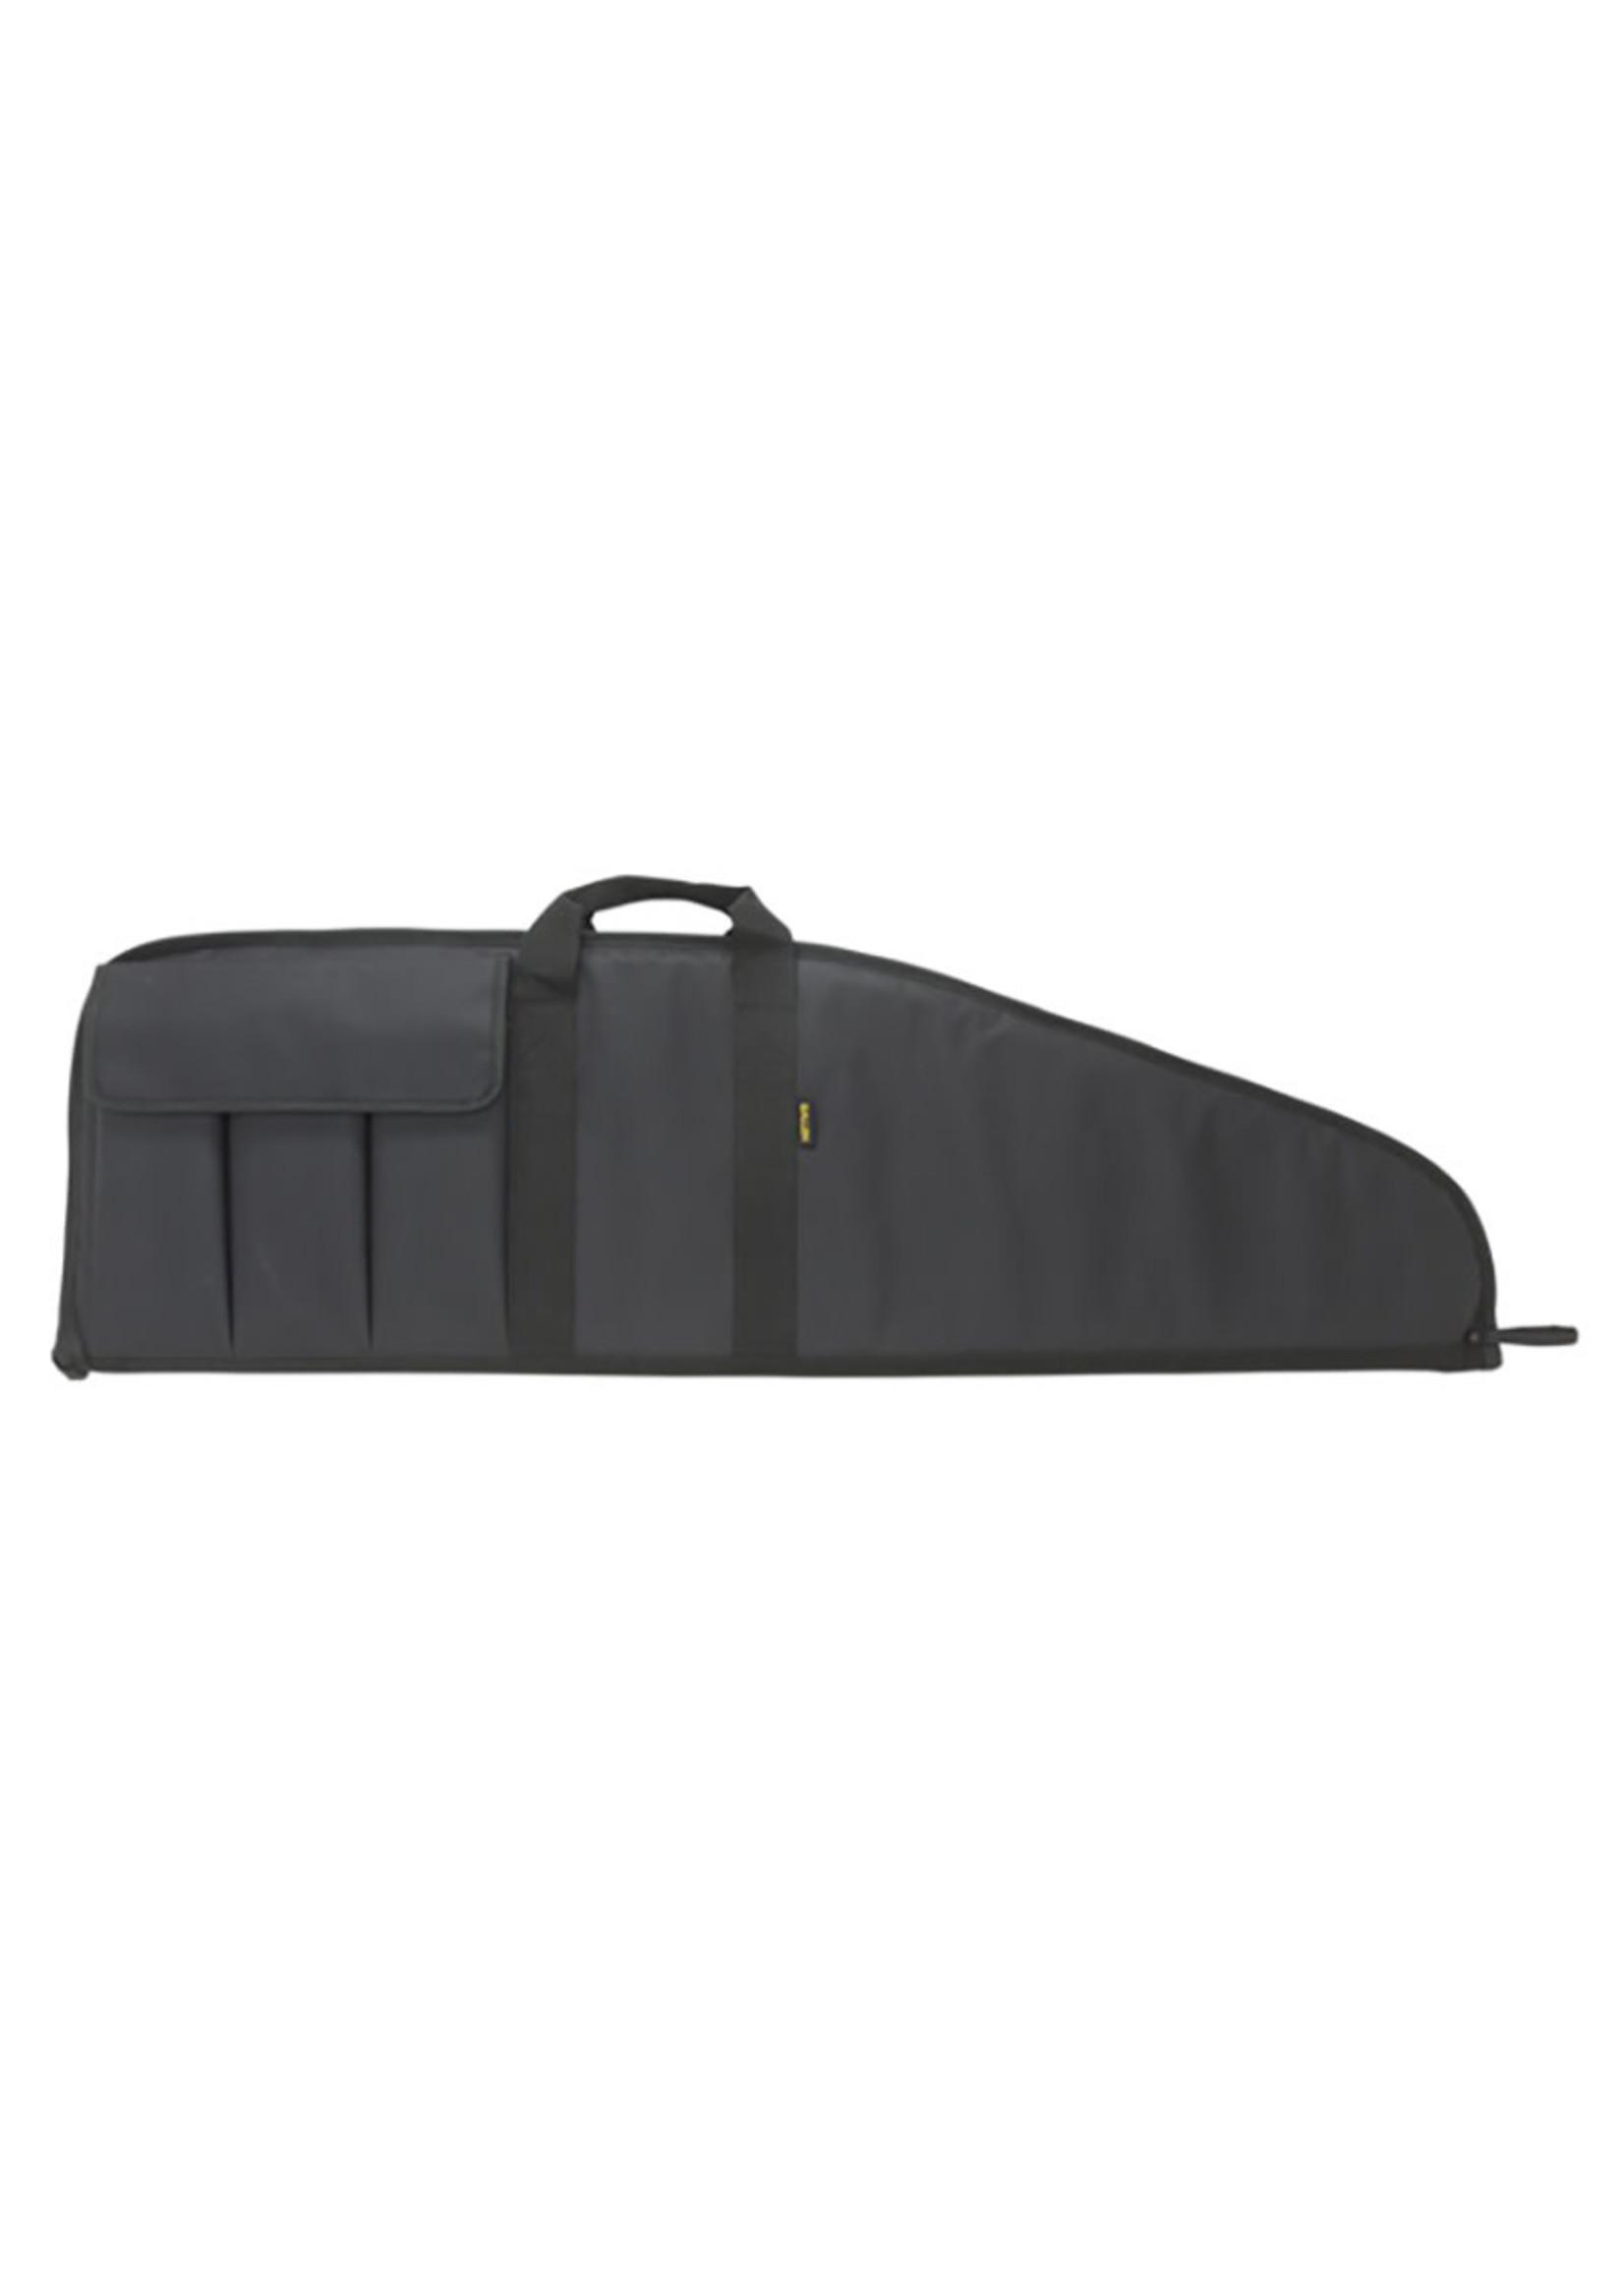 "Allen Company Allen Company Pride Six Engage Tactical Rifle Case, 42"", Black, Multiple External Pockets"